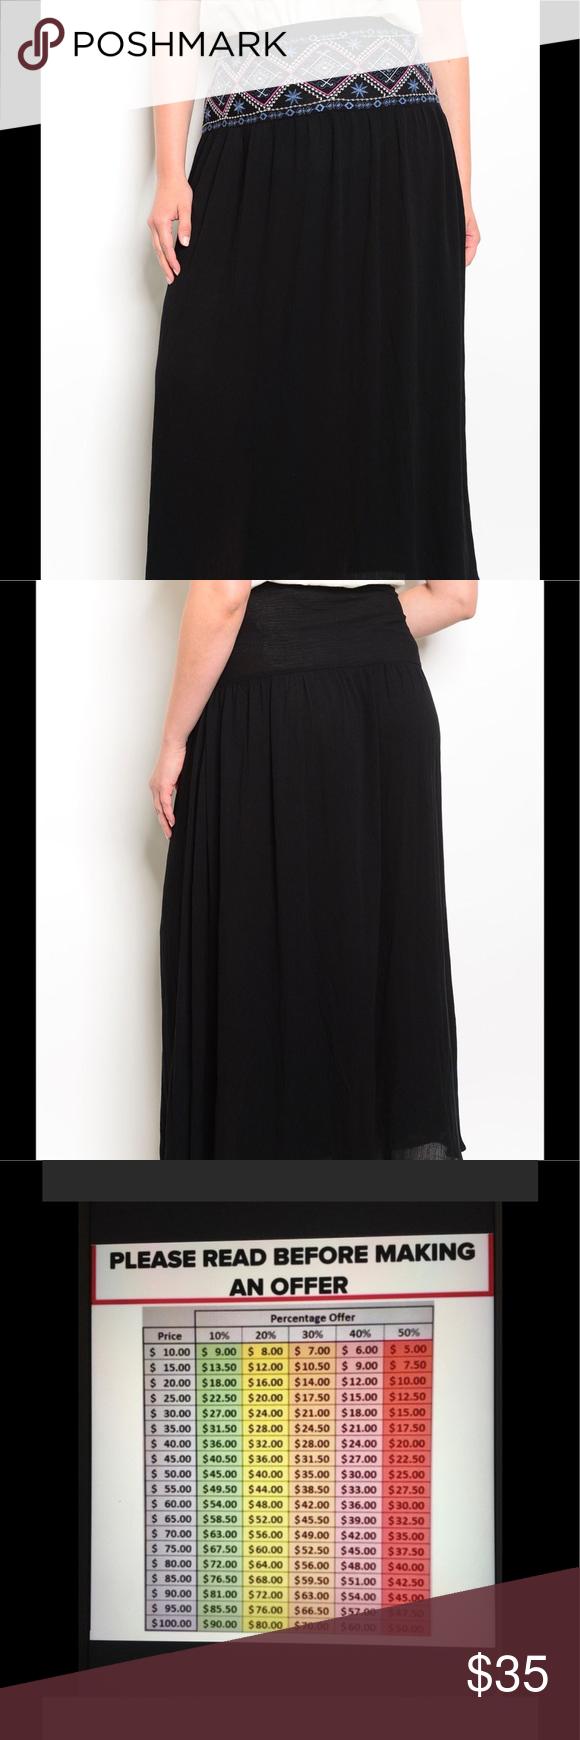 150a2ead4ce7c + 🎉HP🎉 Boho Embroidery Skirt Plus Size Beautiful Plus Size High Waist